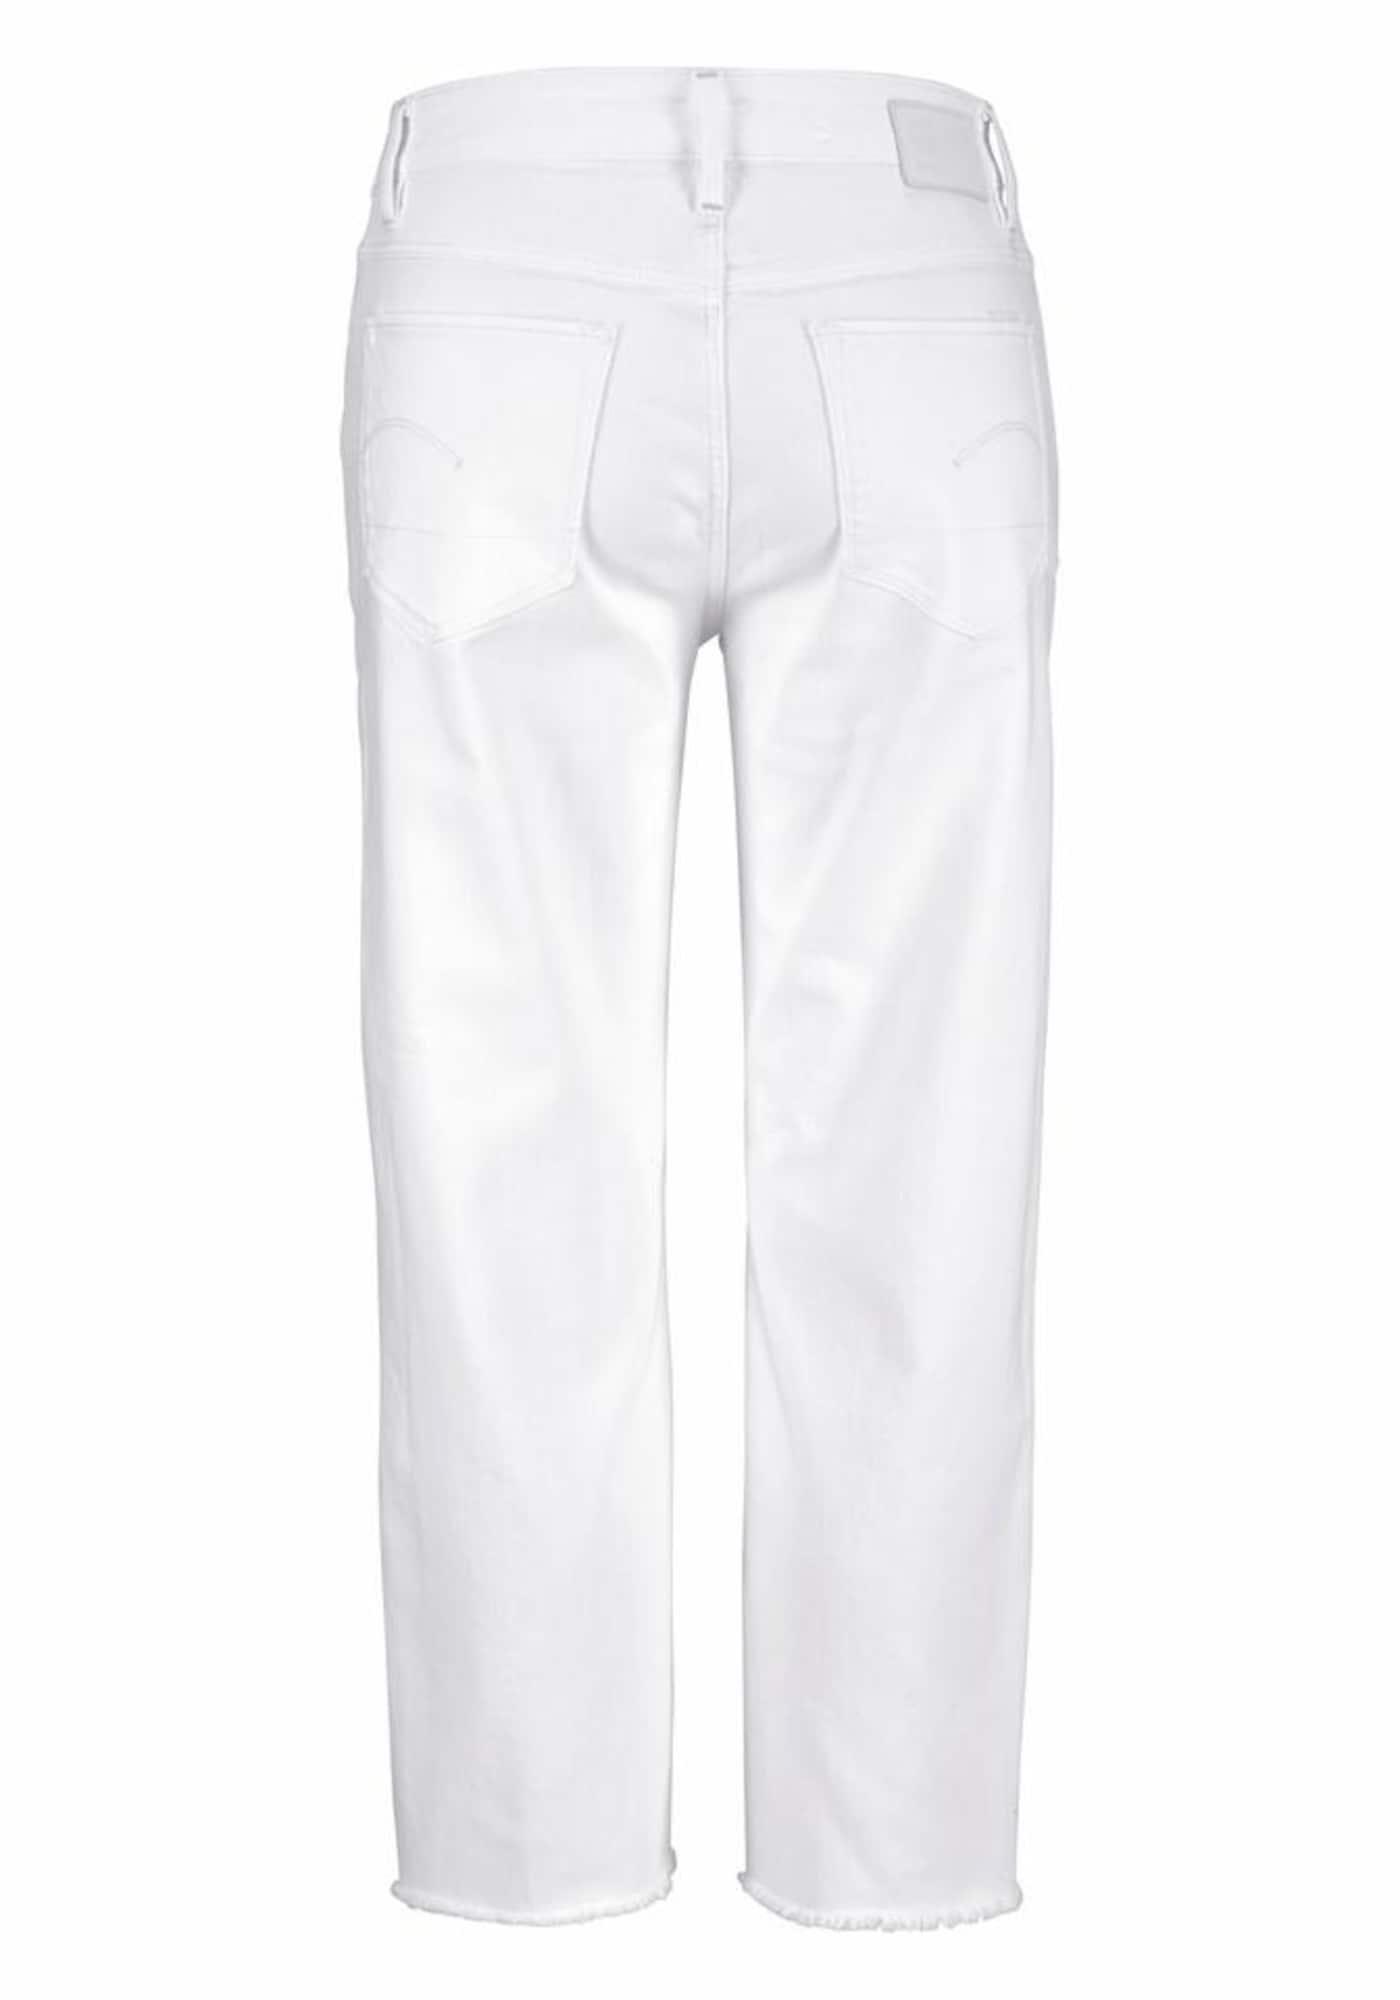 G-STAR RAW Dames Jeans 3301 white denim